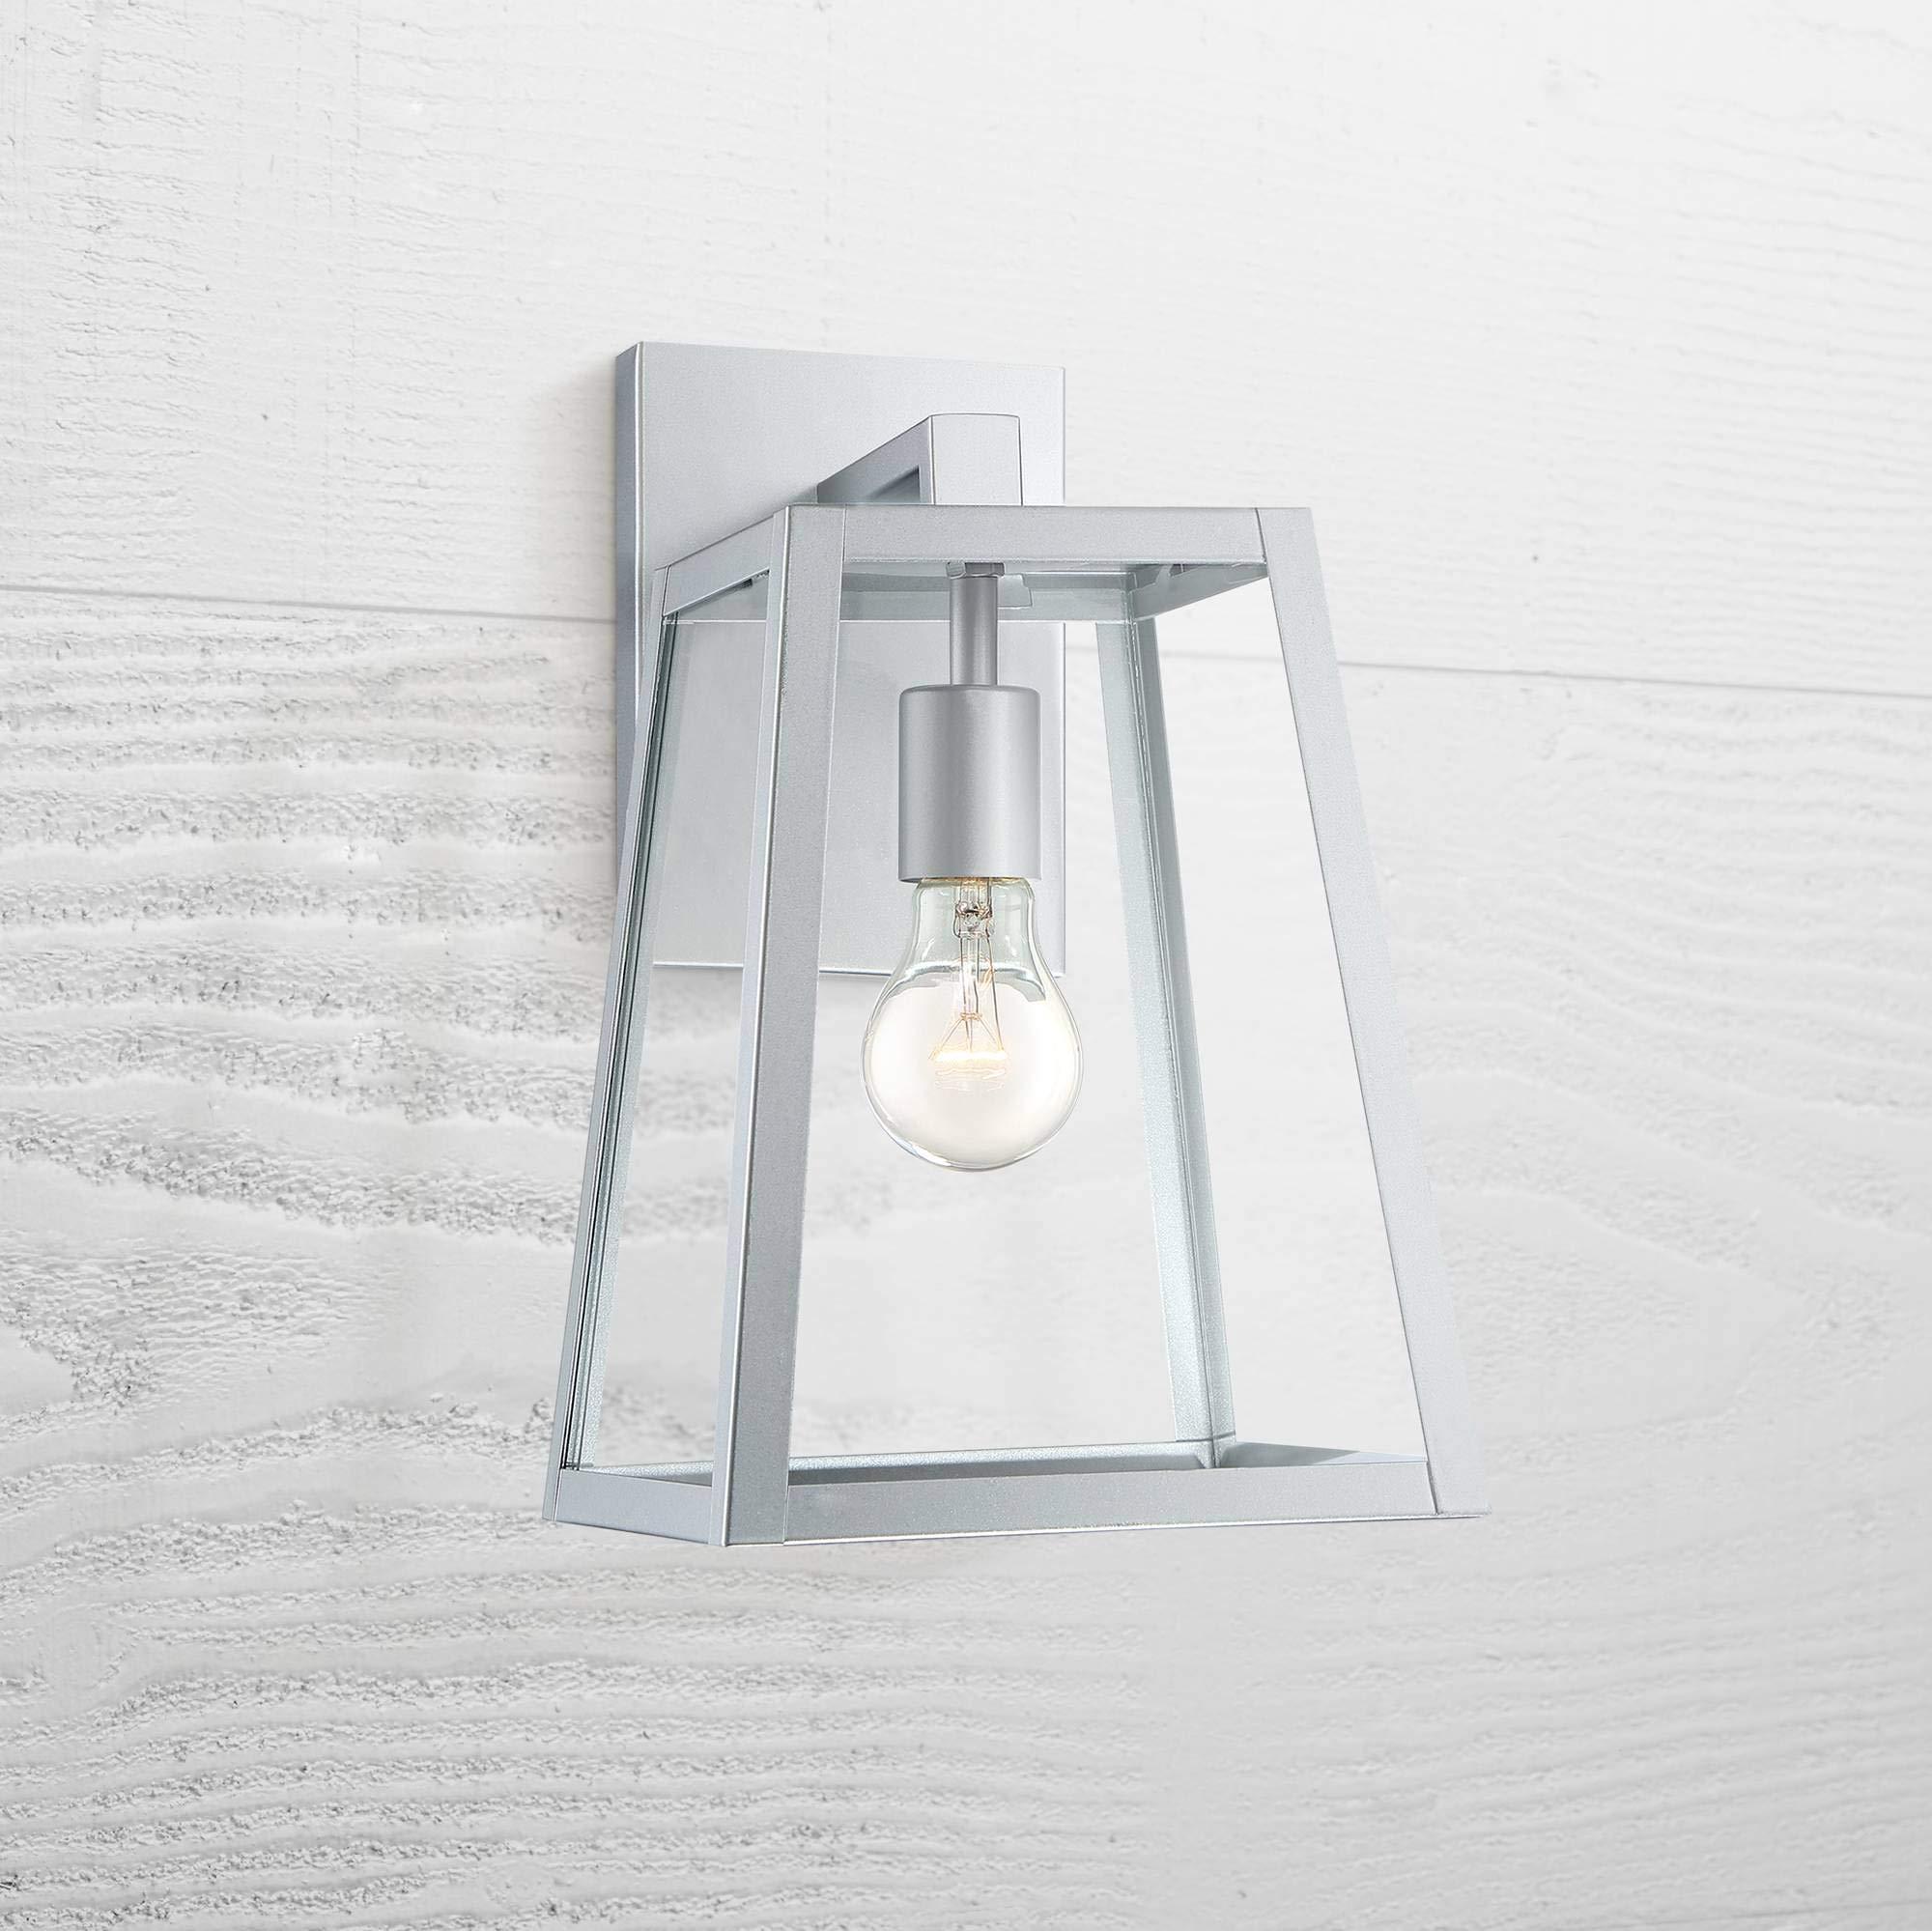 Arrington Modern Outdoor Wall Light Fixture Sleek Silver Steel 13'' Clear Glass for Exterior House Porch Patio Deck - John Timberland by John Timberland (Image #1)